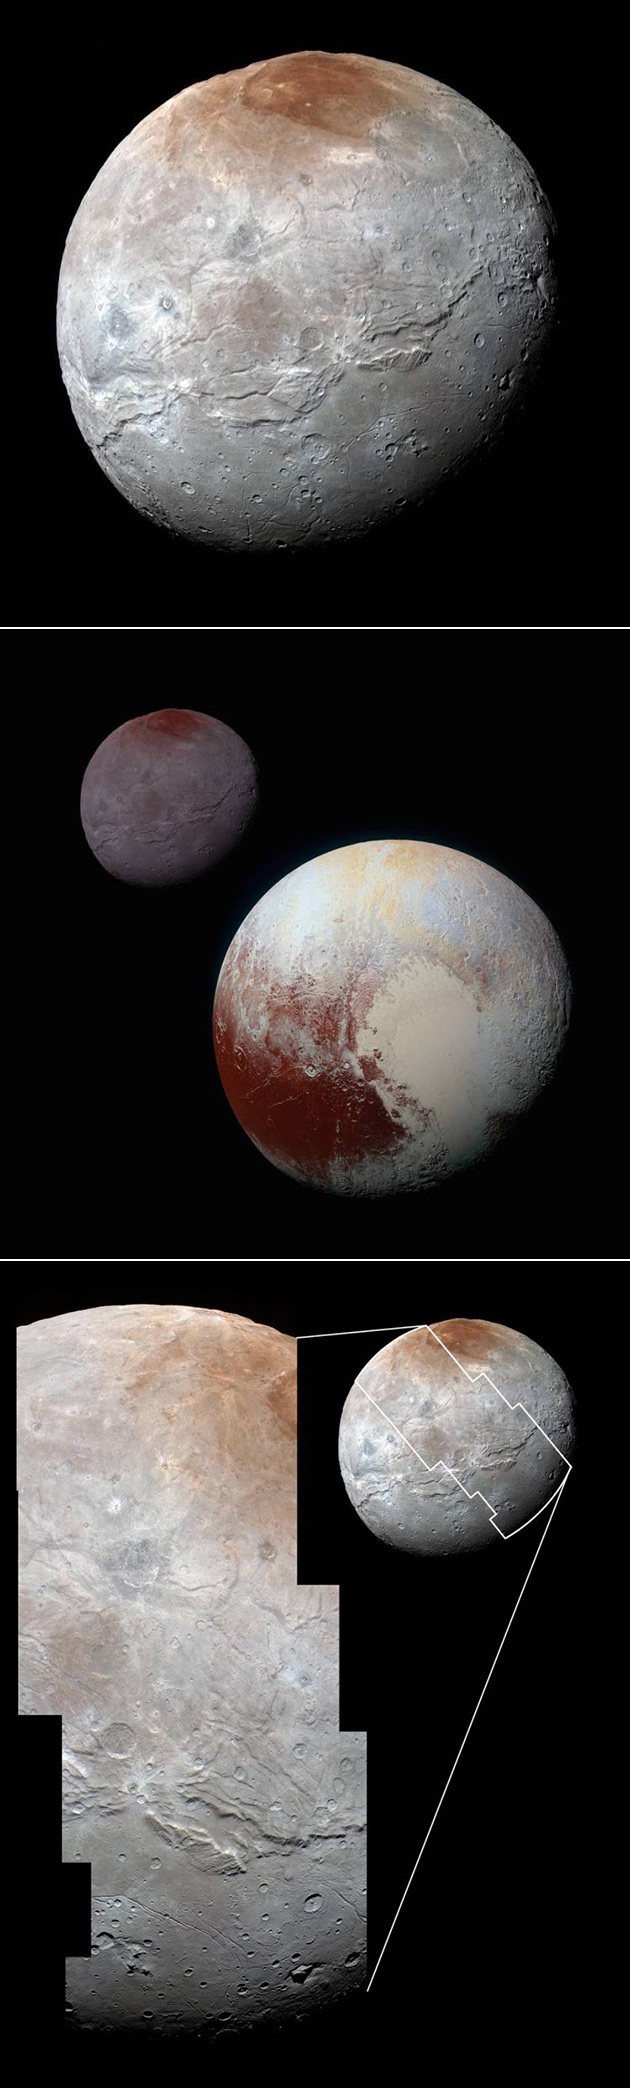 Pluto Moon Charon